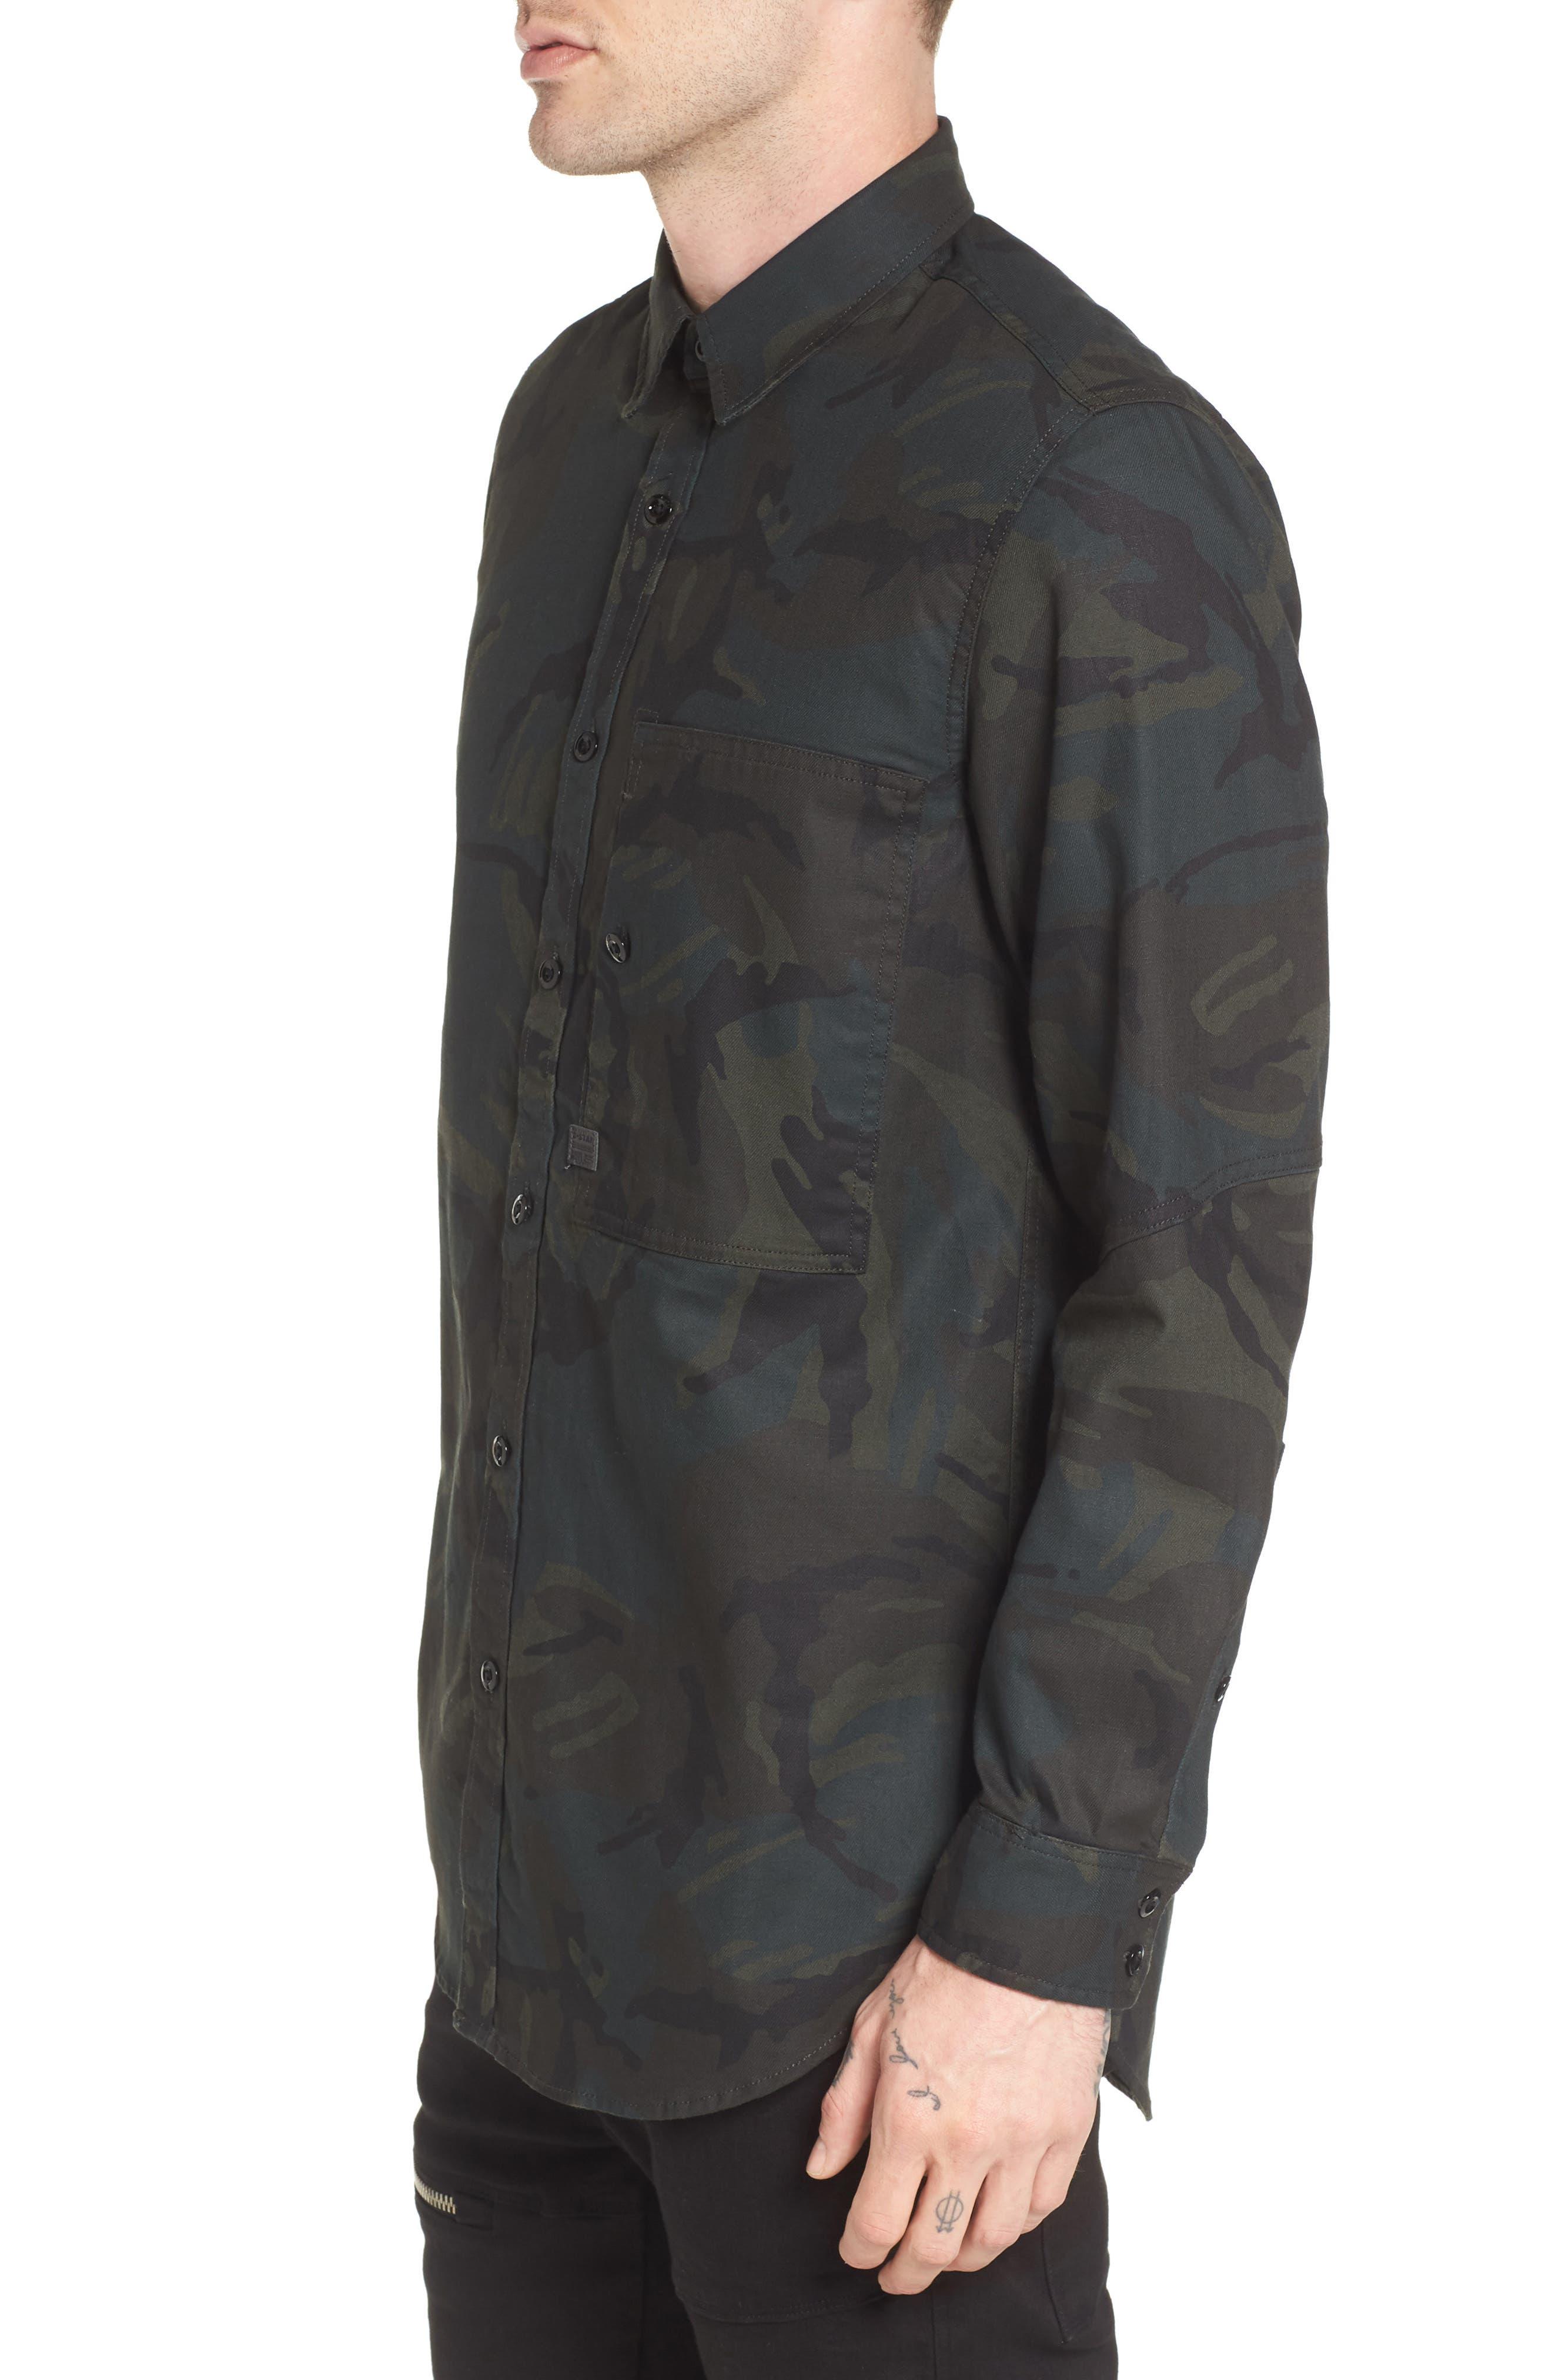 Stalt Long Sleeve Denim Shirt,                             Alternate thumbnail 3, color,                             Asphalt/ Black